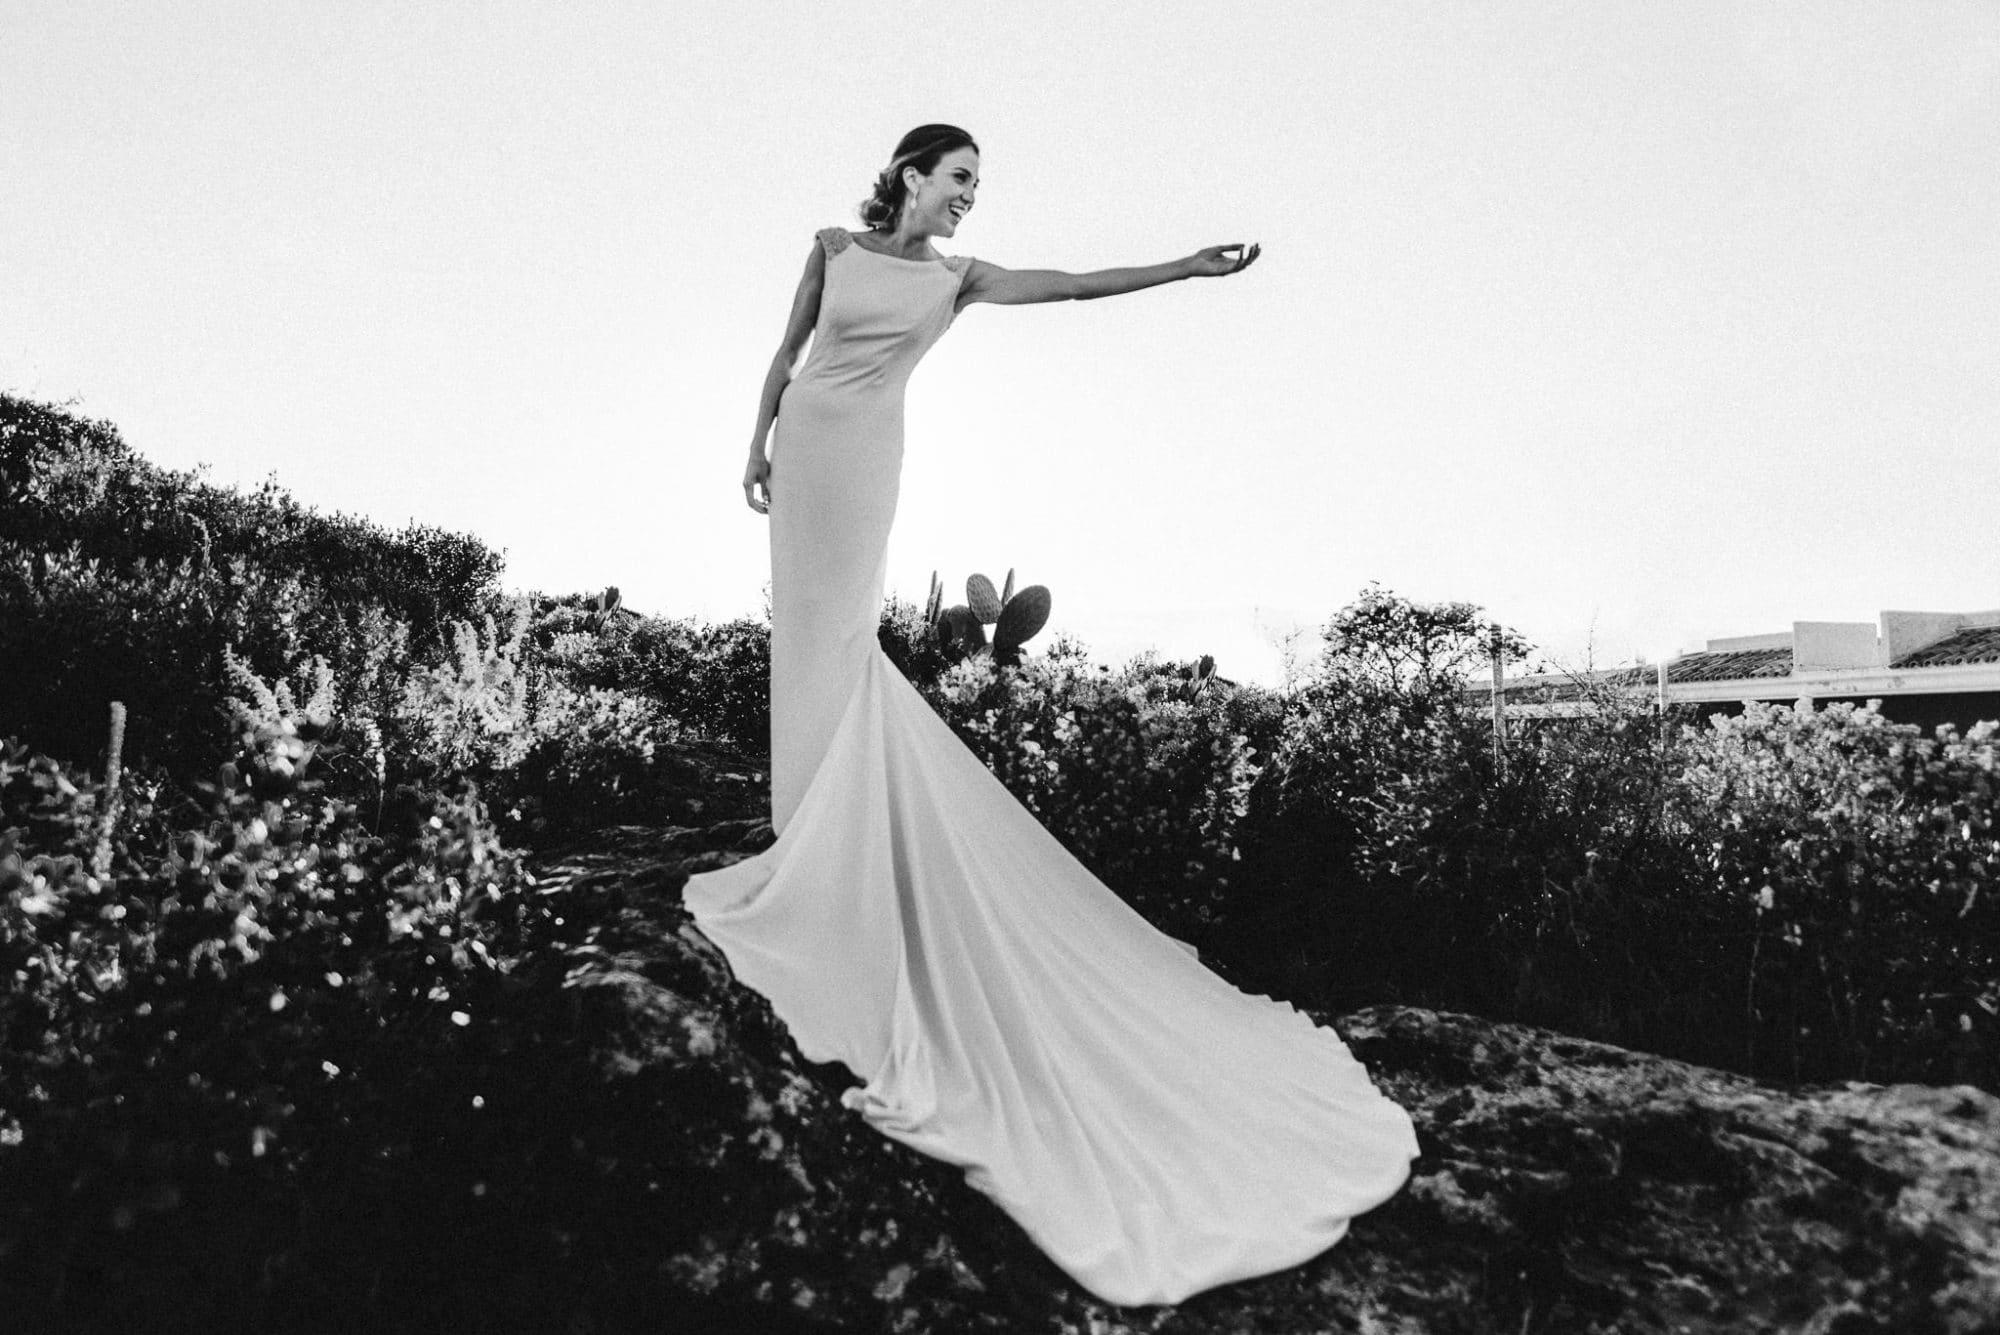 olbia Photographer reviews valeria mameli